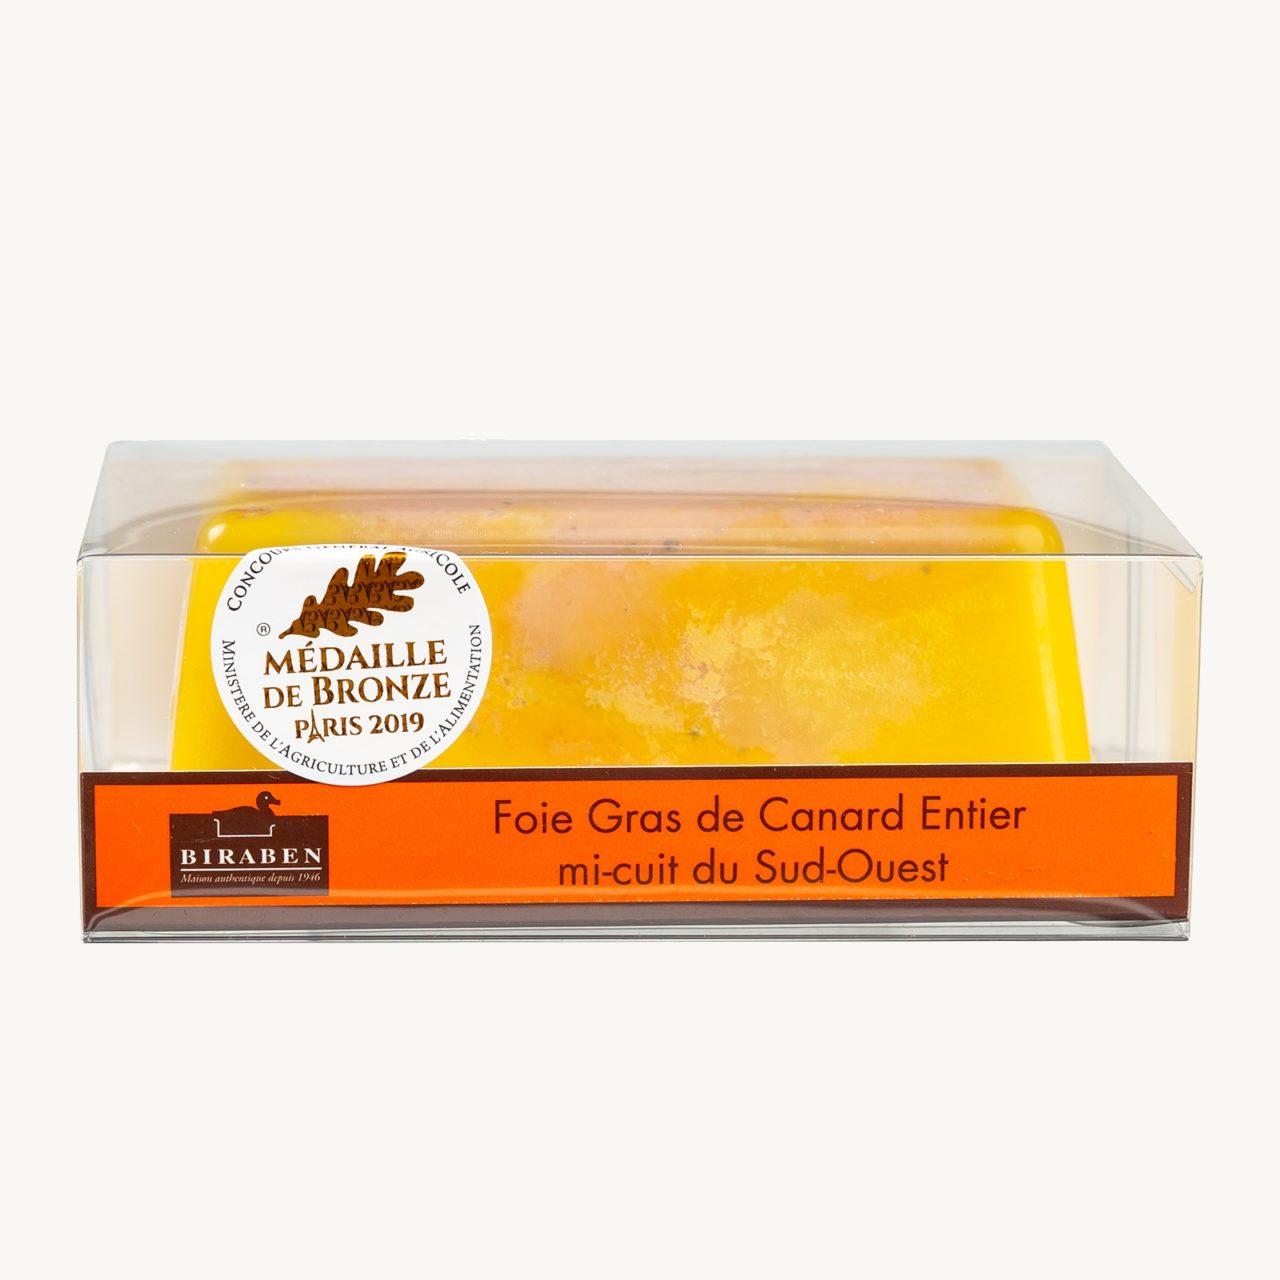 terrine Foie gras de canard entier mi cuit nature